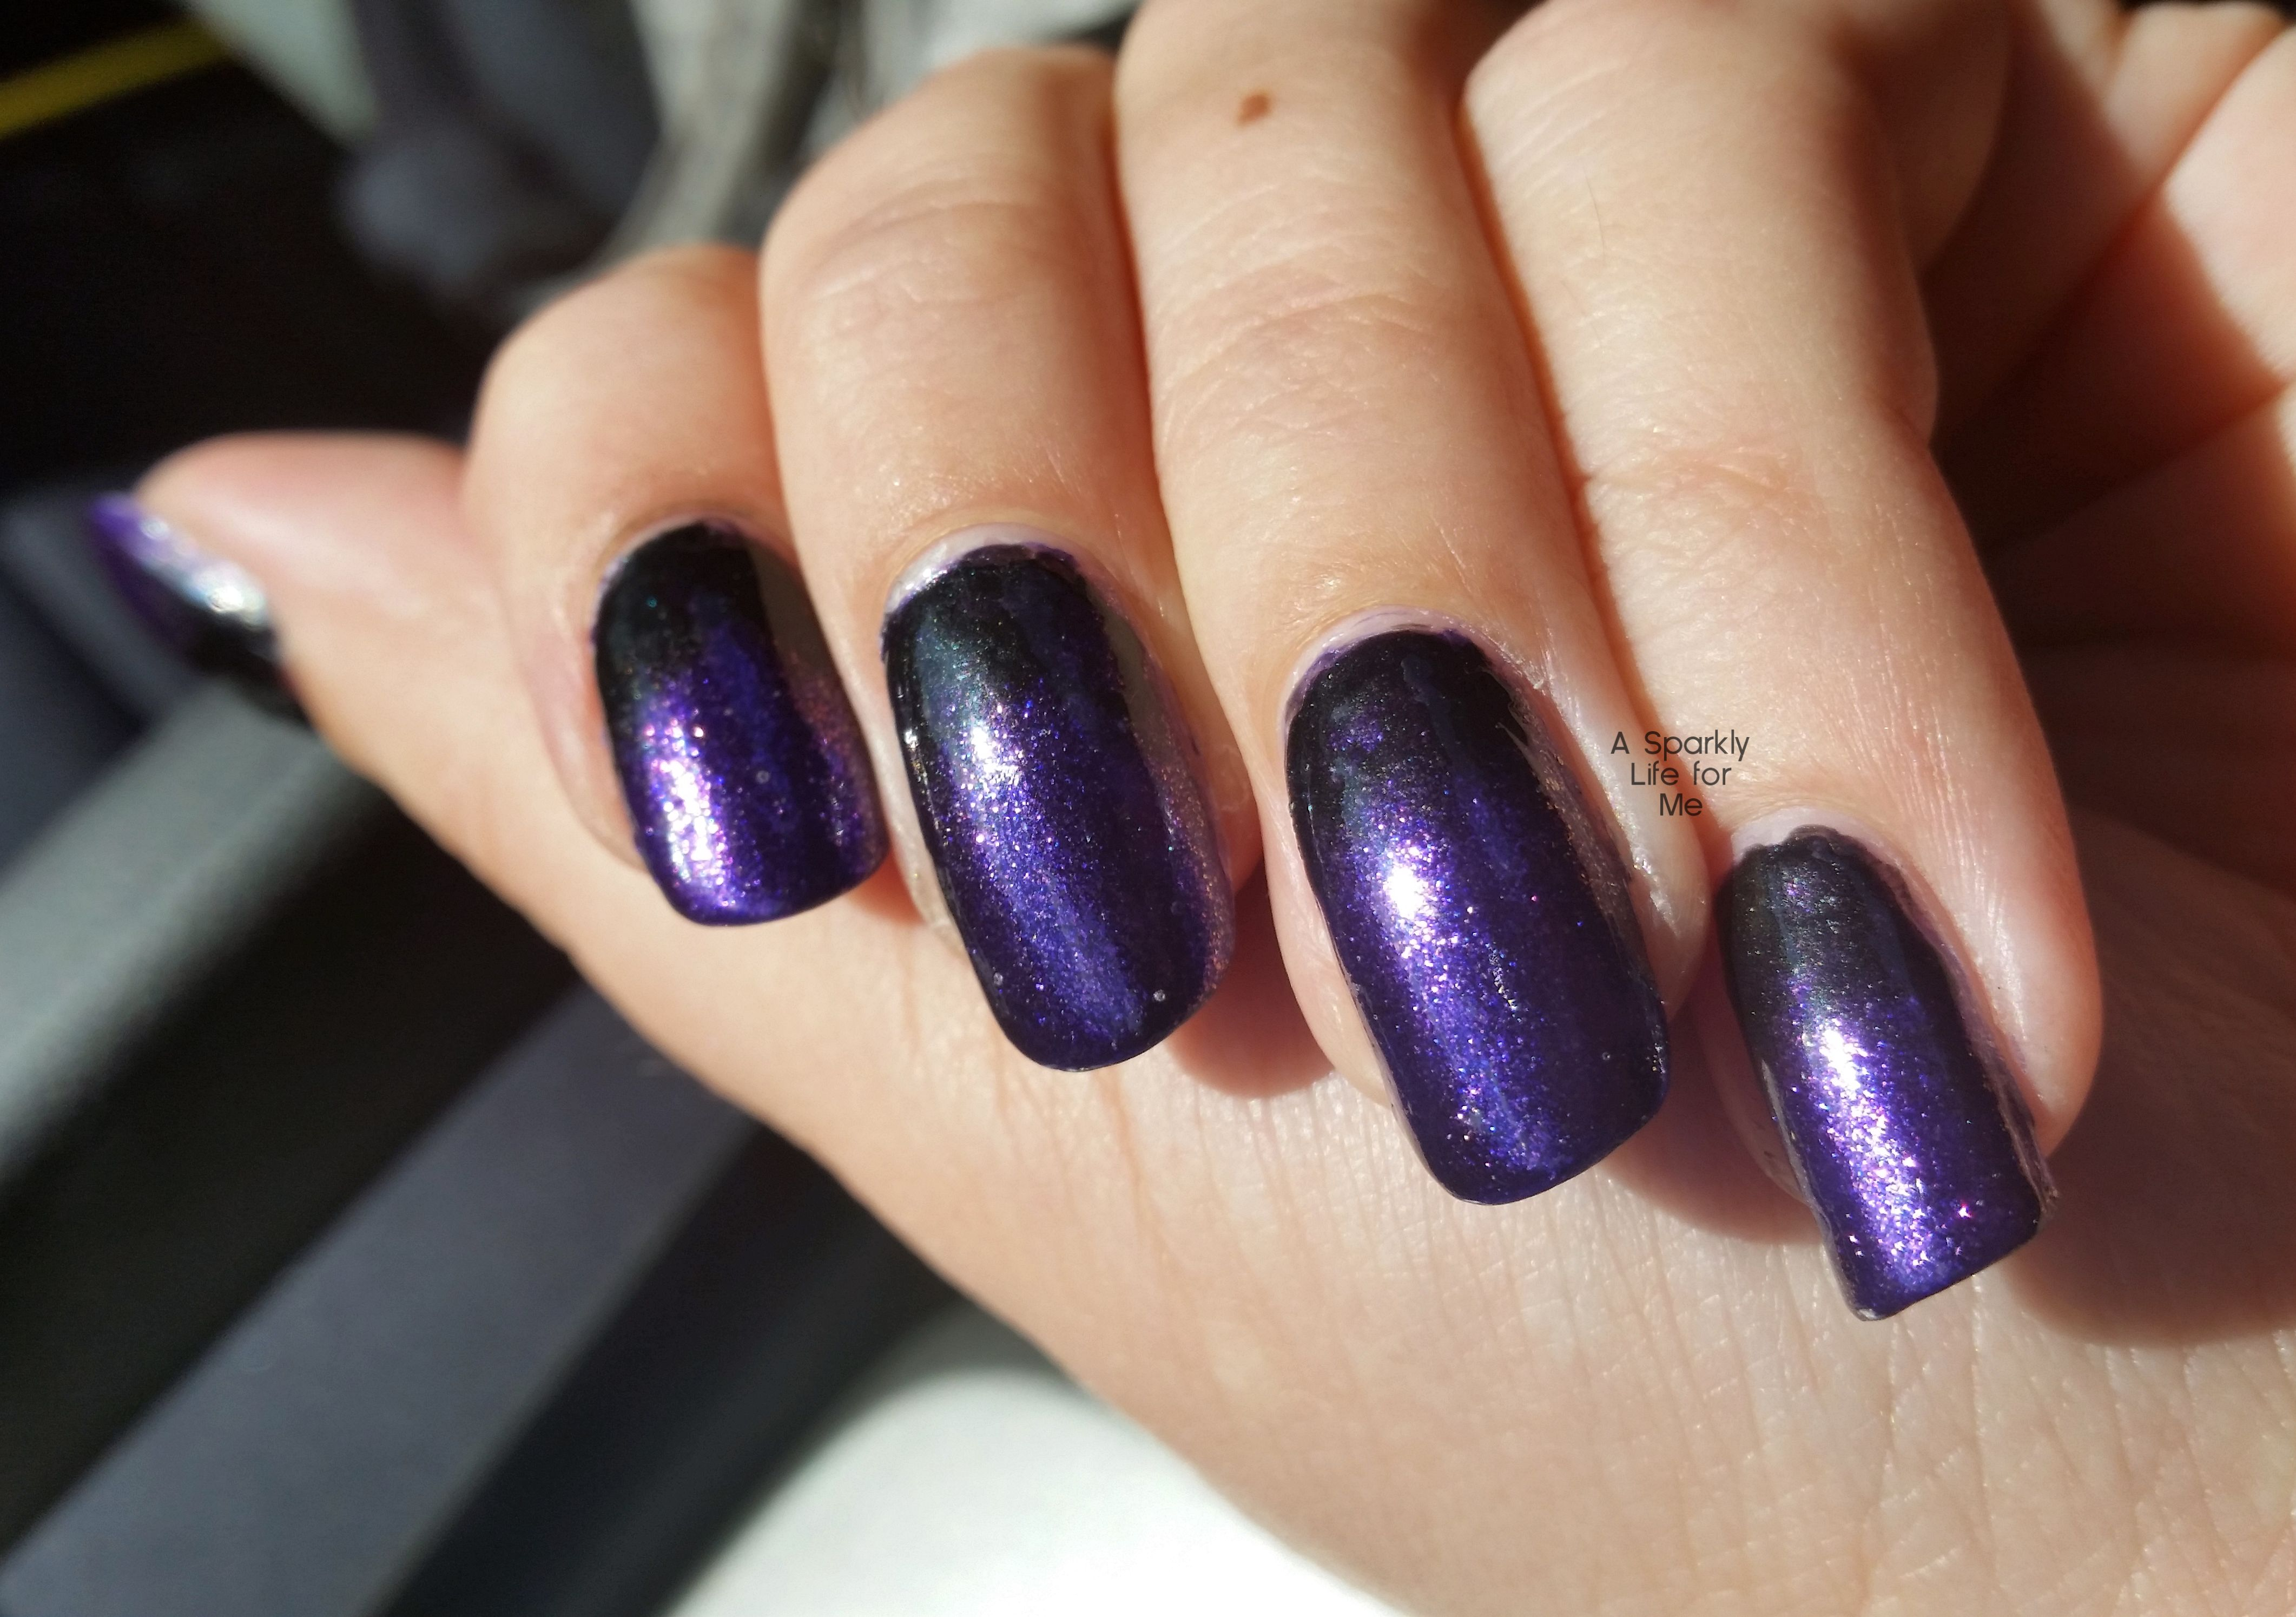 Purple And Black Gradient Nails A Simple Halloween Nail Art Look Halloween Nails Purple Nail Art Designs Purple Nail Art